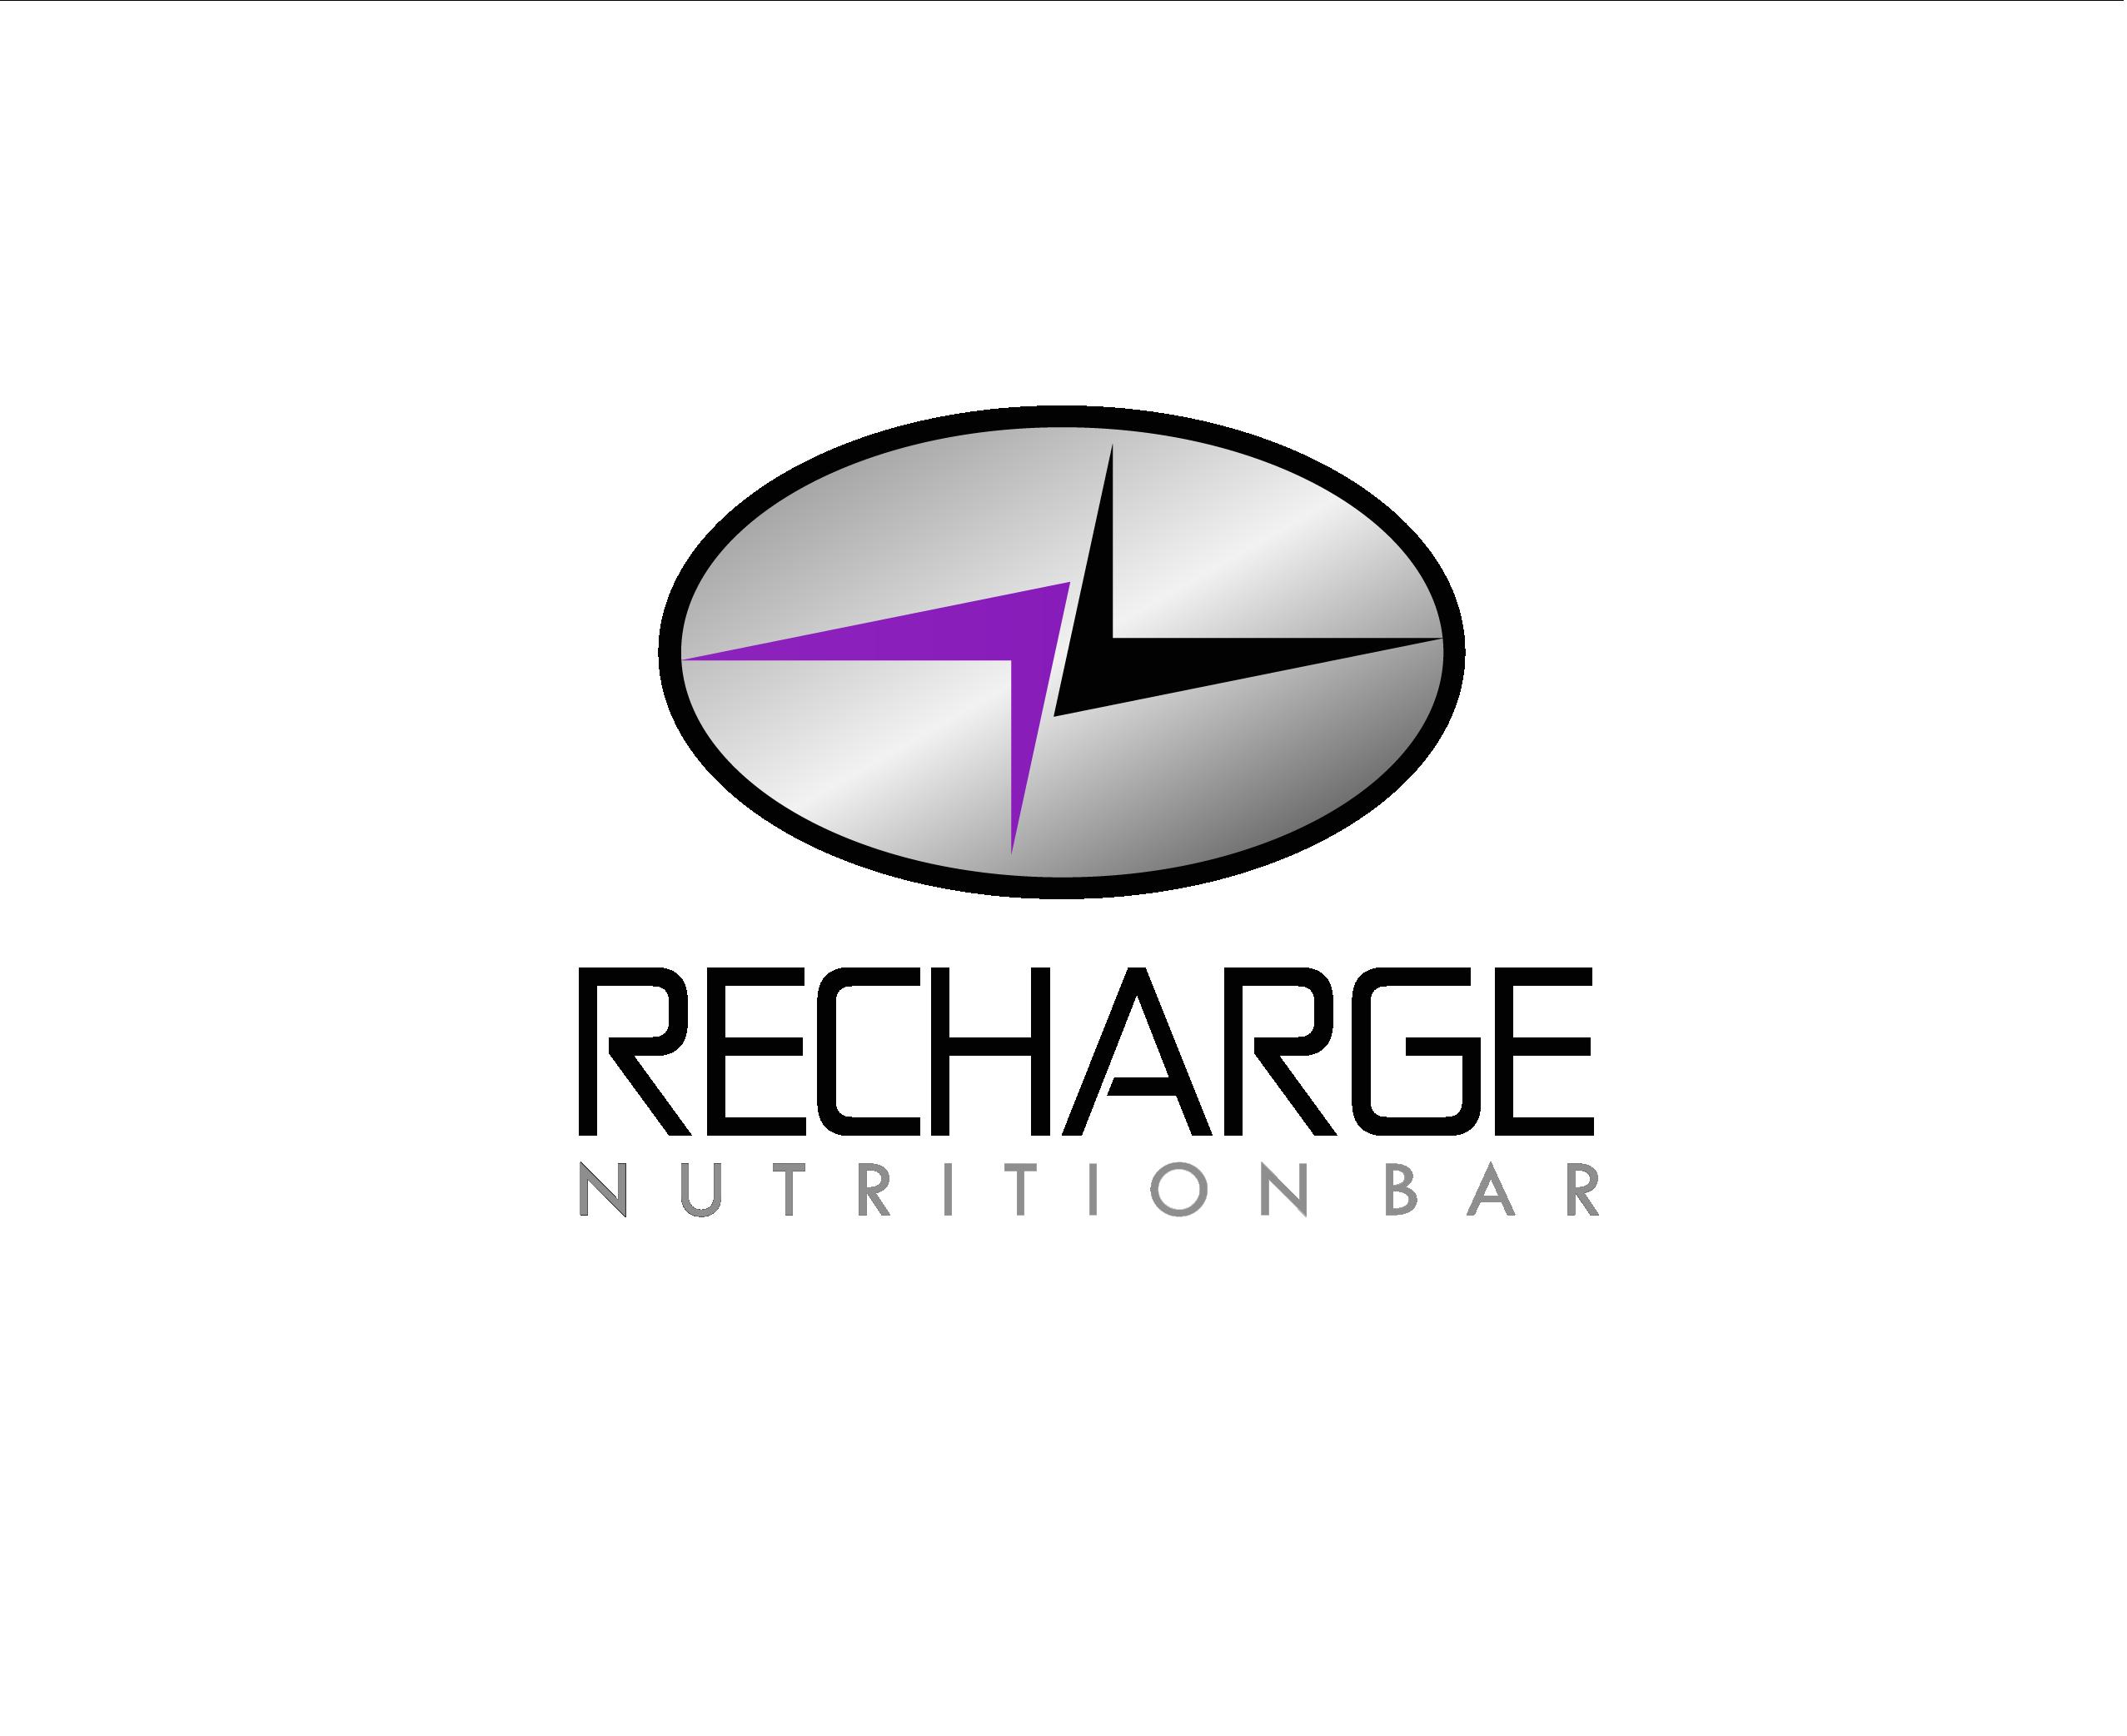 Logo Design by Allan Esclamado - Entry No. 51 in the Logo Design Contest Artistic Logo Design for Recharge Nutrition Bar Inc.